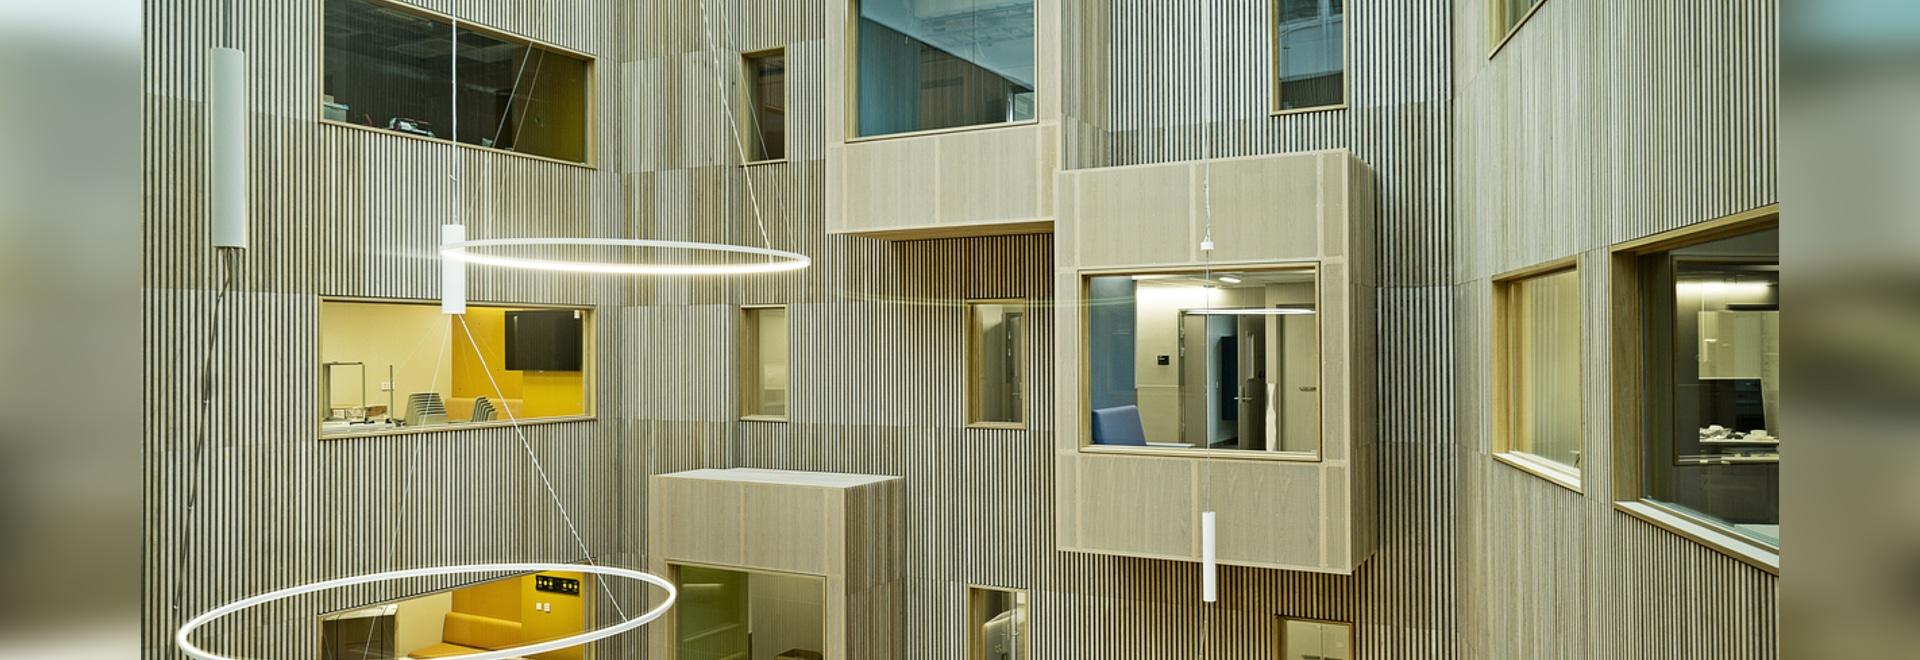 Hôpital/C.F. Møller Architects de Haraldsplass